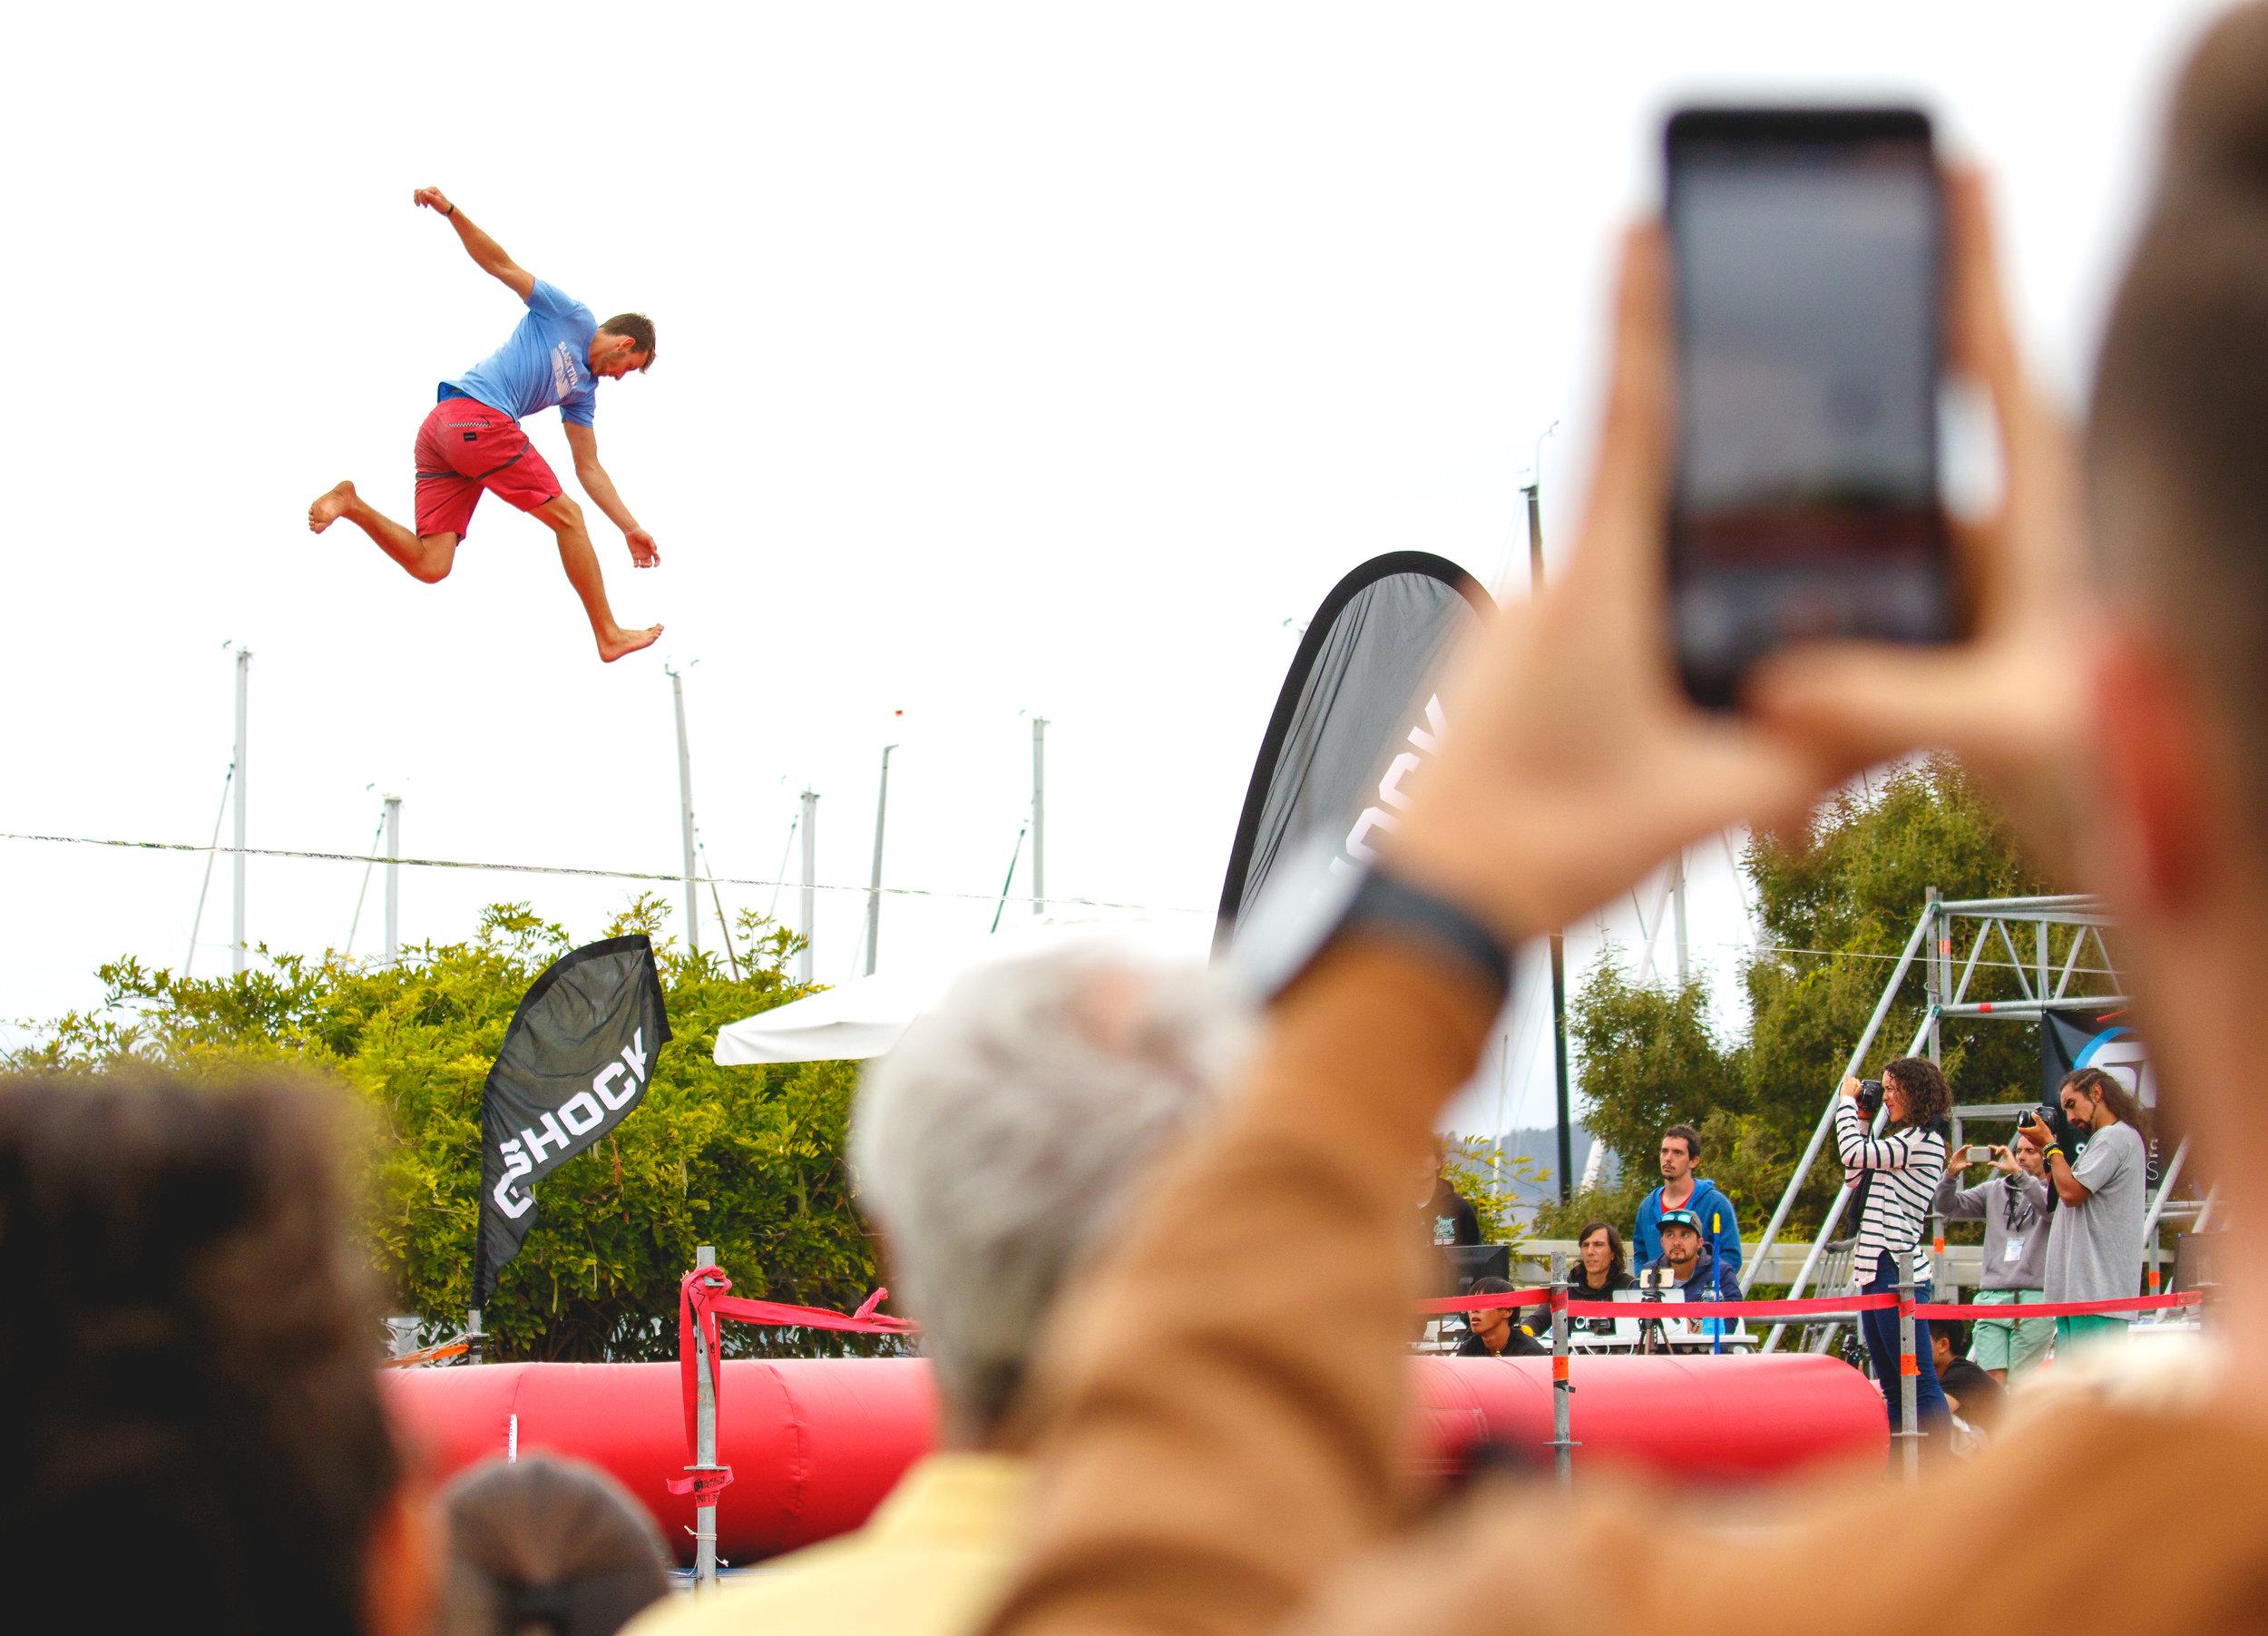 vigo street stunts spain espana Slackline Lyell Grunberg show performance spectacle Highline trickline.JPG